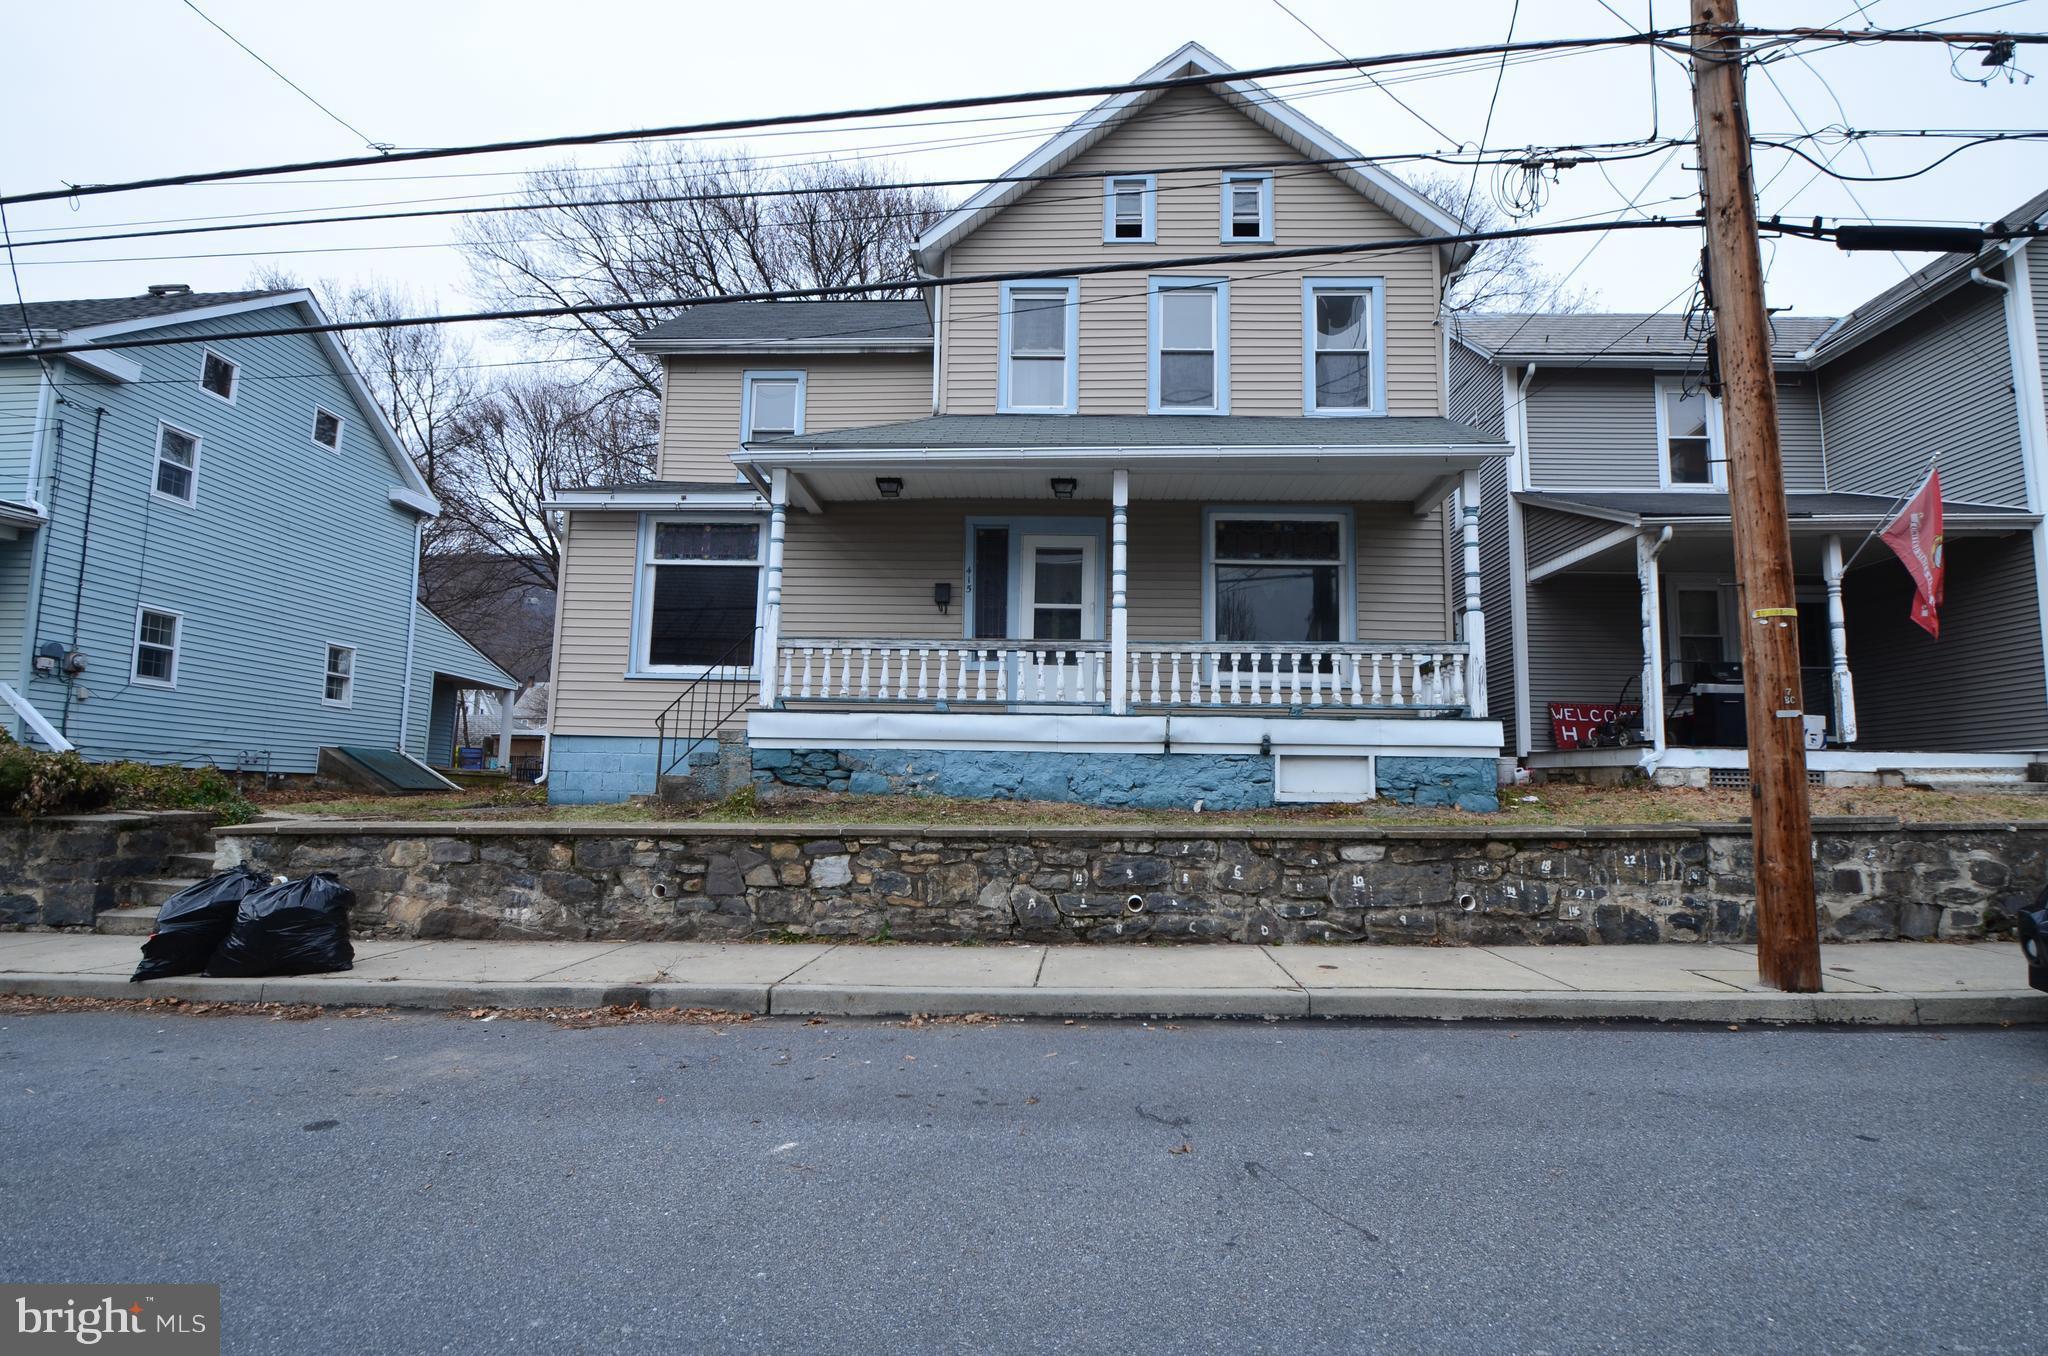 415 GEORGE STREET, PEN ARGYL, PA 18072